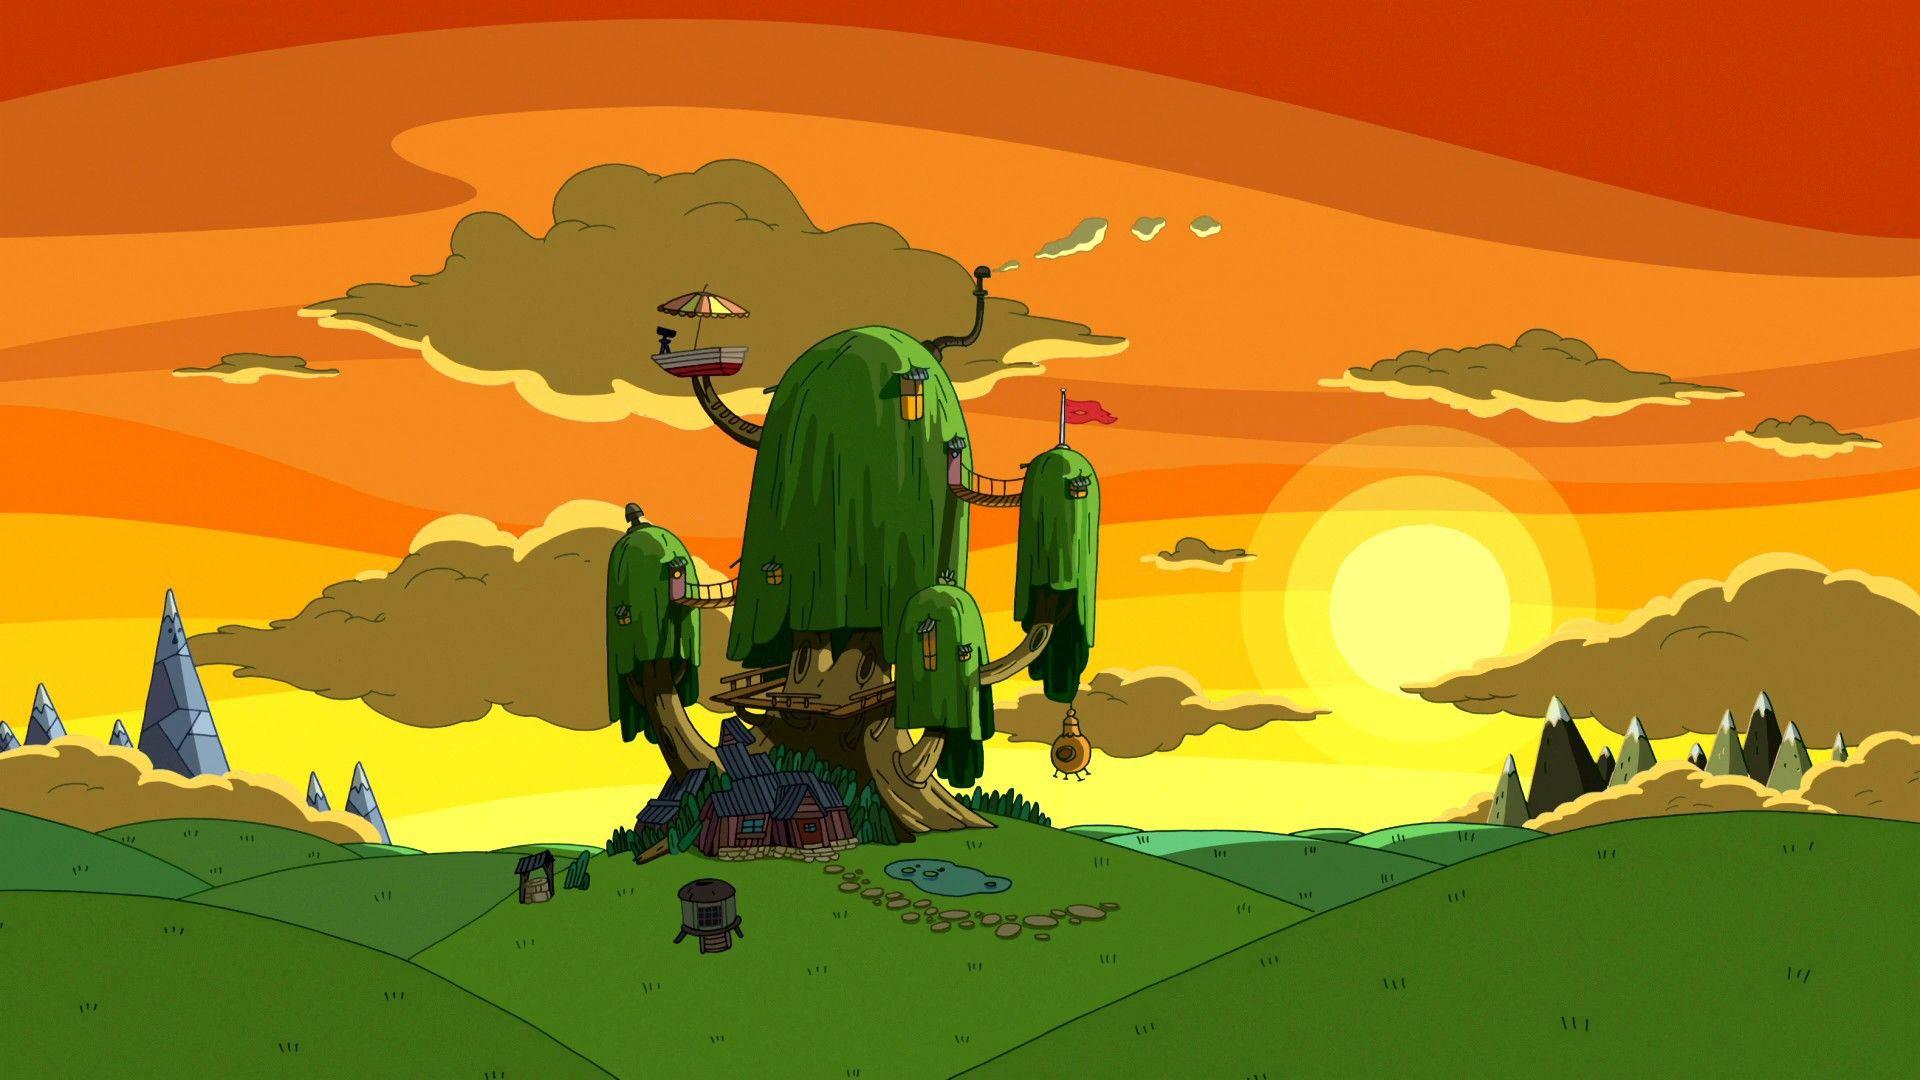 Cartoon Network Sunset Nature Houses Adventure Time 1920x1080